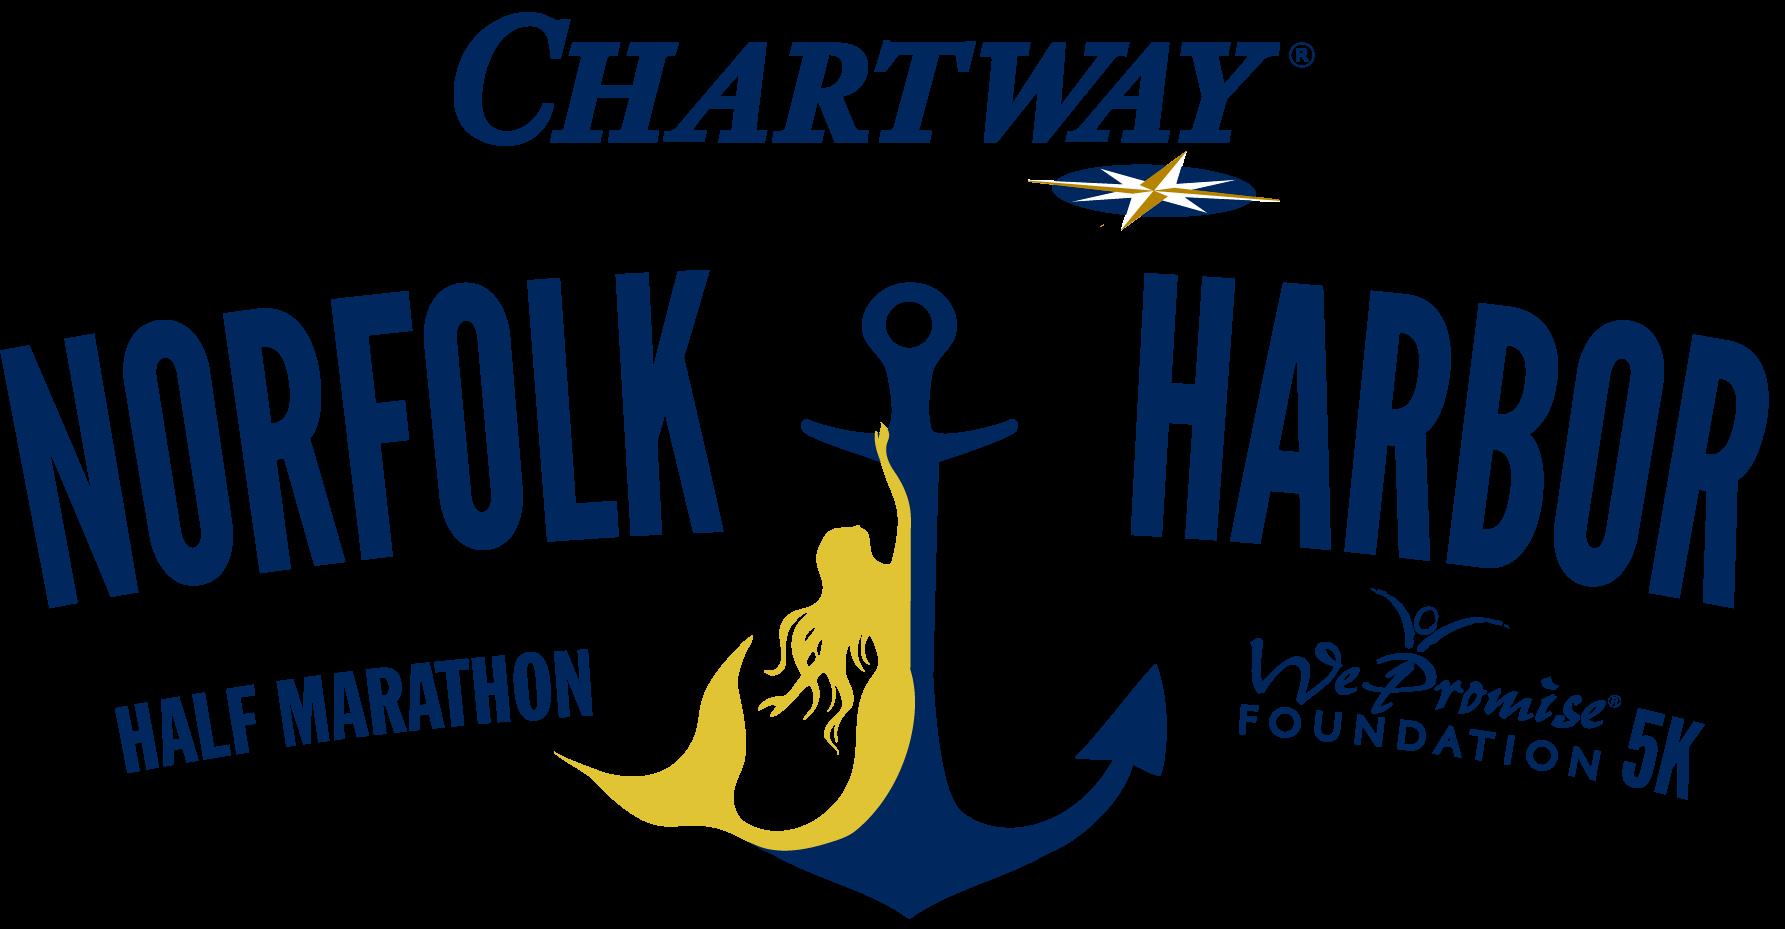 Chartway Norfolk Harbor Half Marathon & We Promise Foundation 5K presented by Bon Secours In Motion Logo